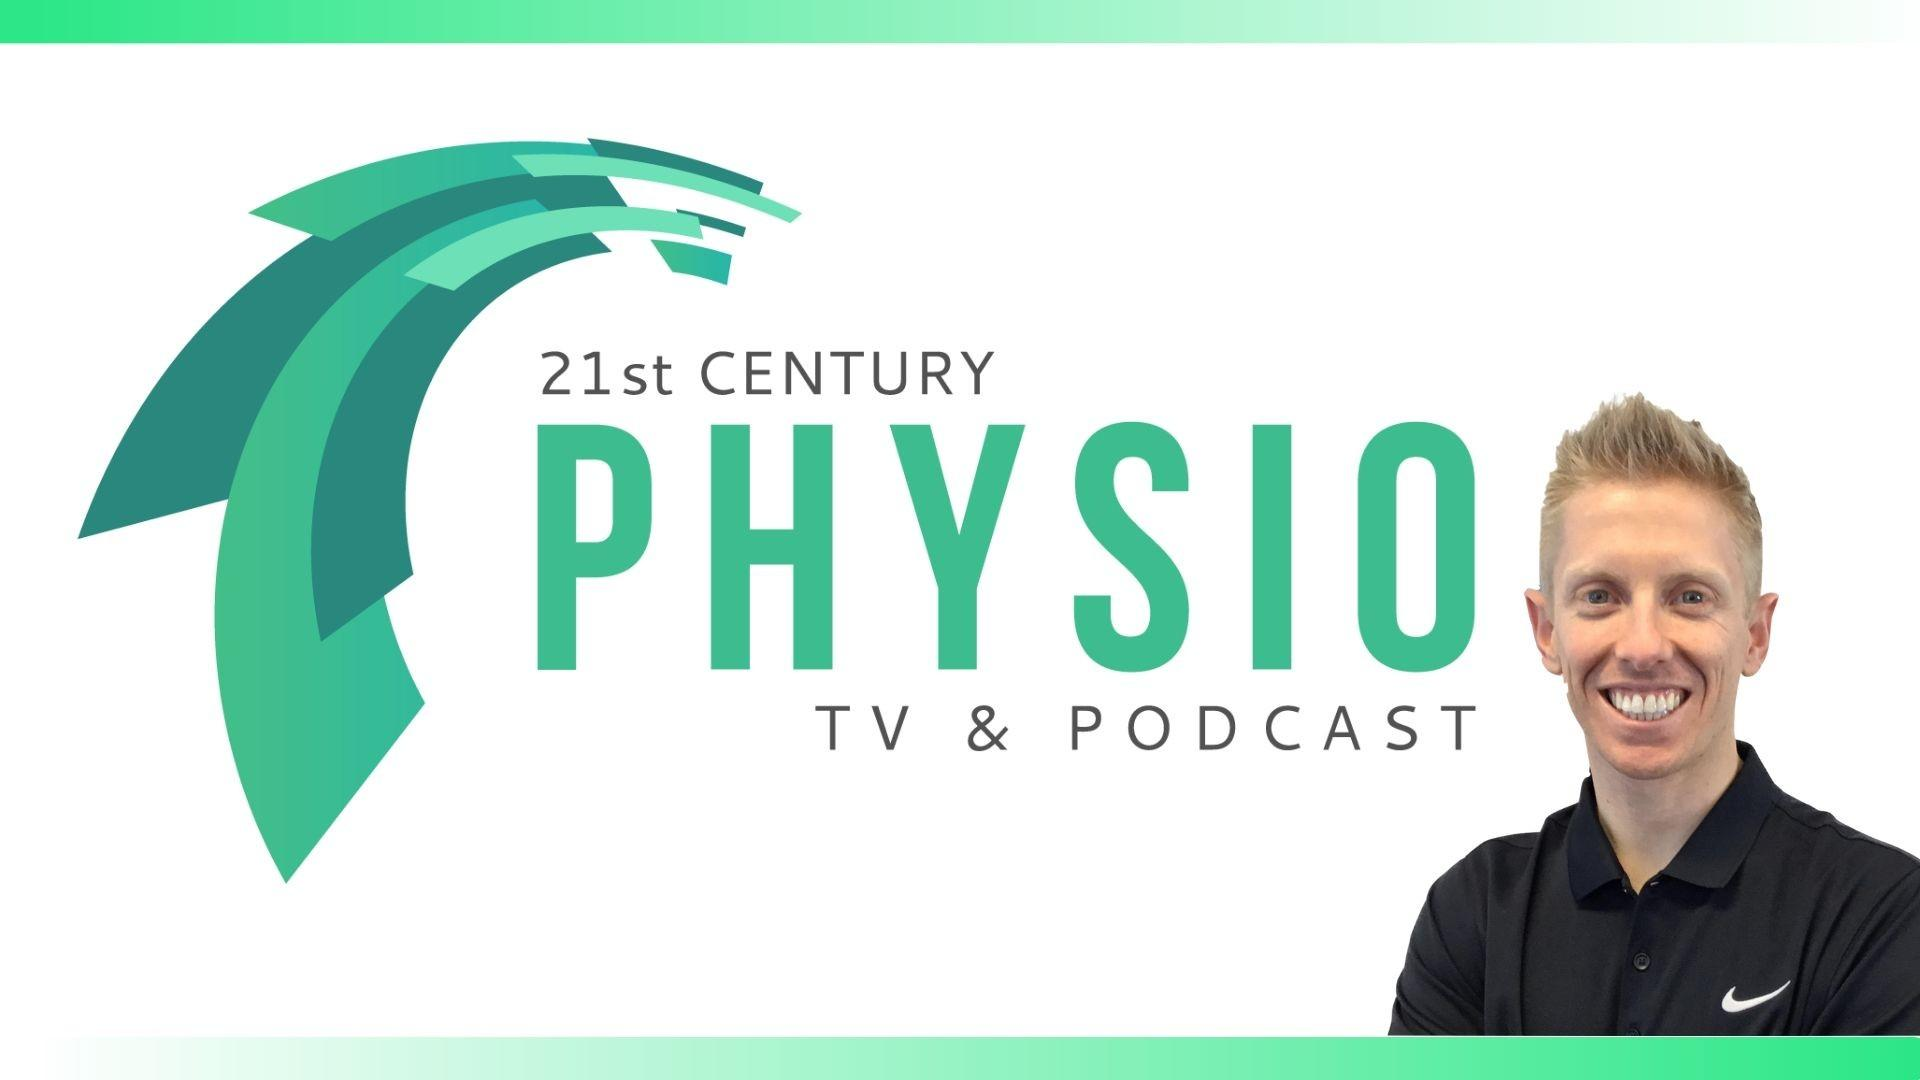 21st Century Physio